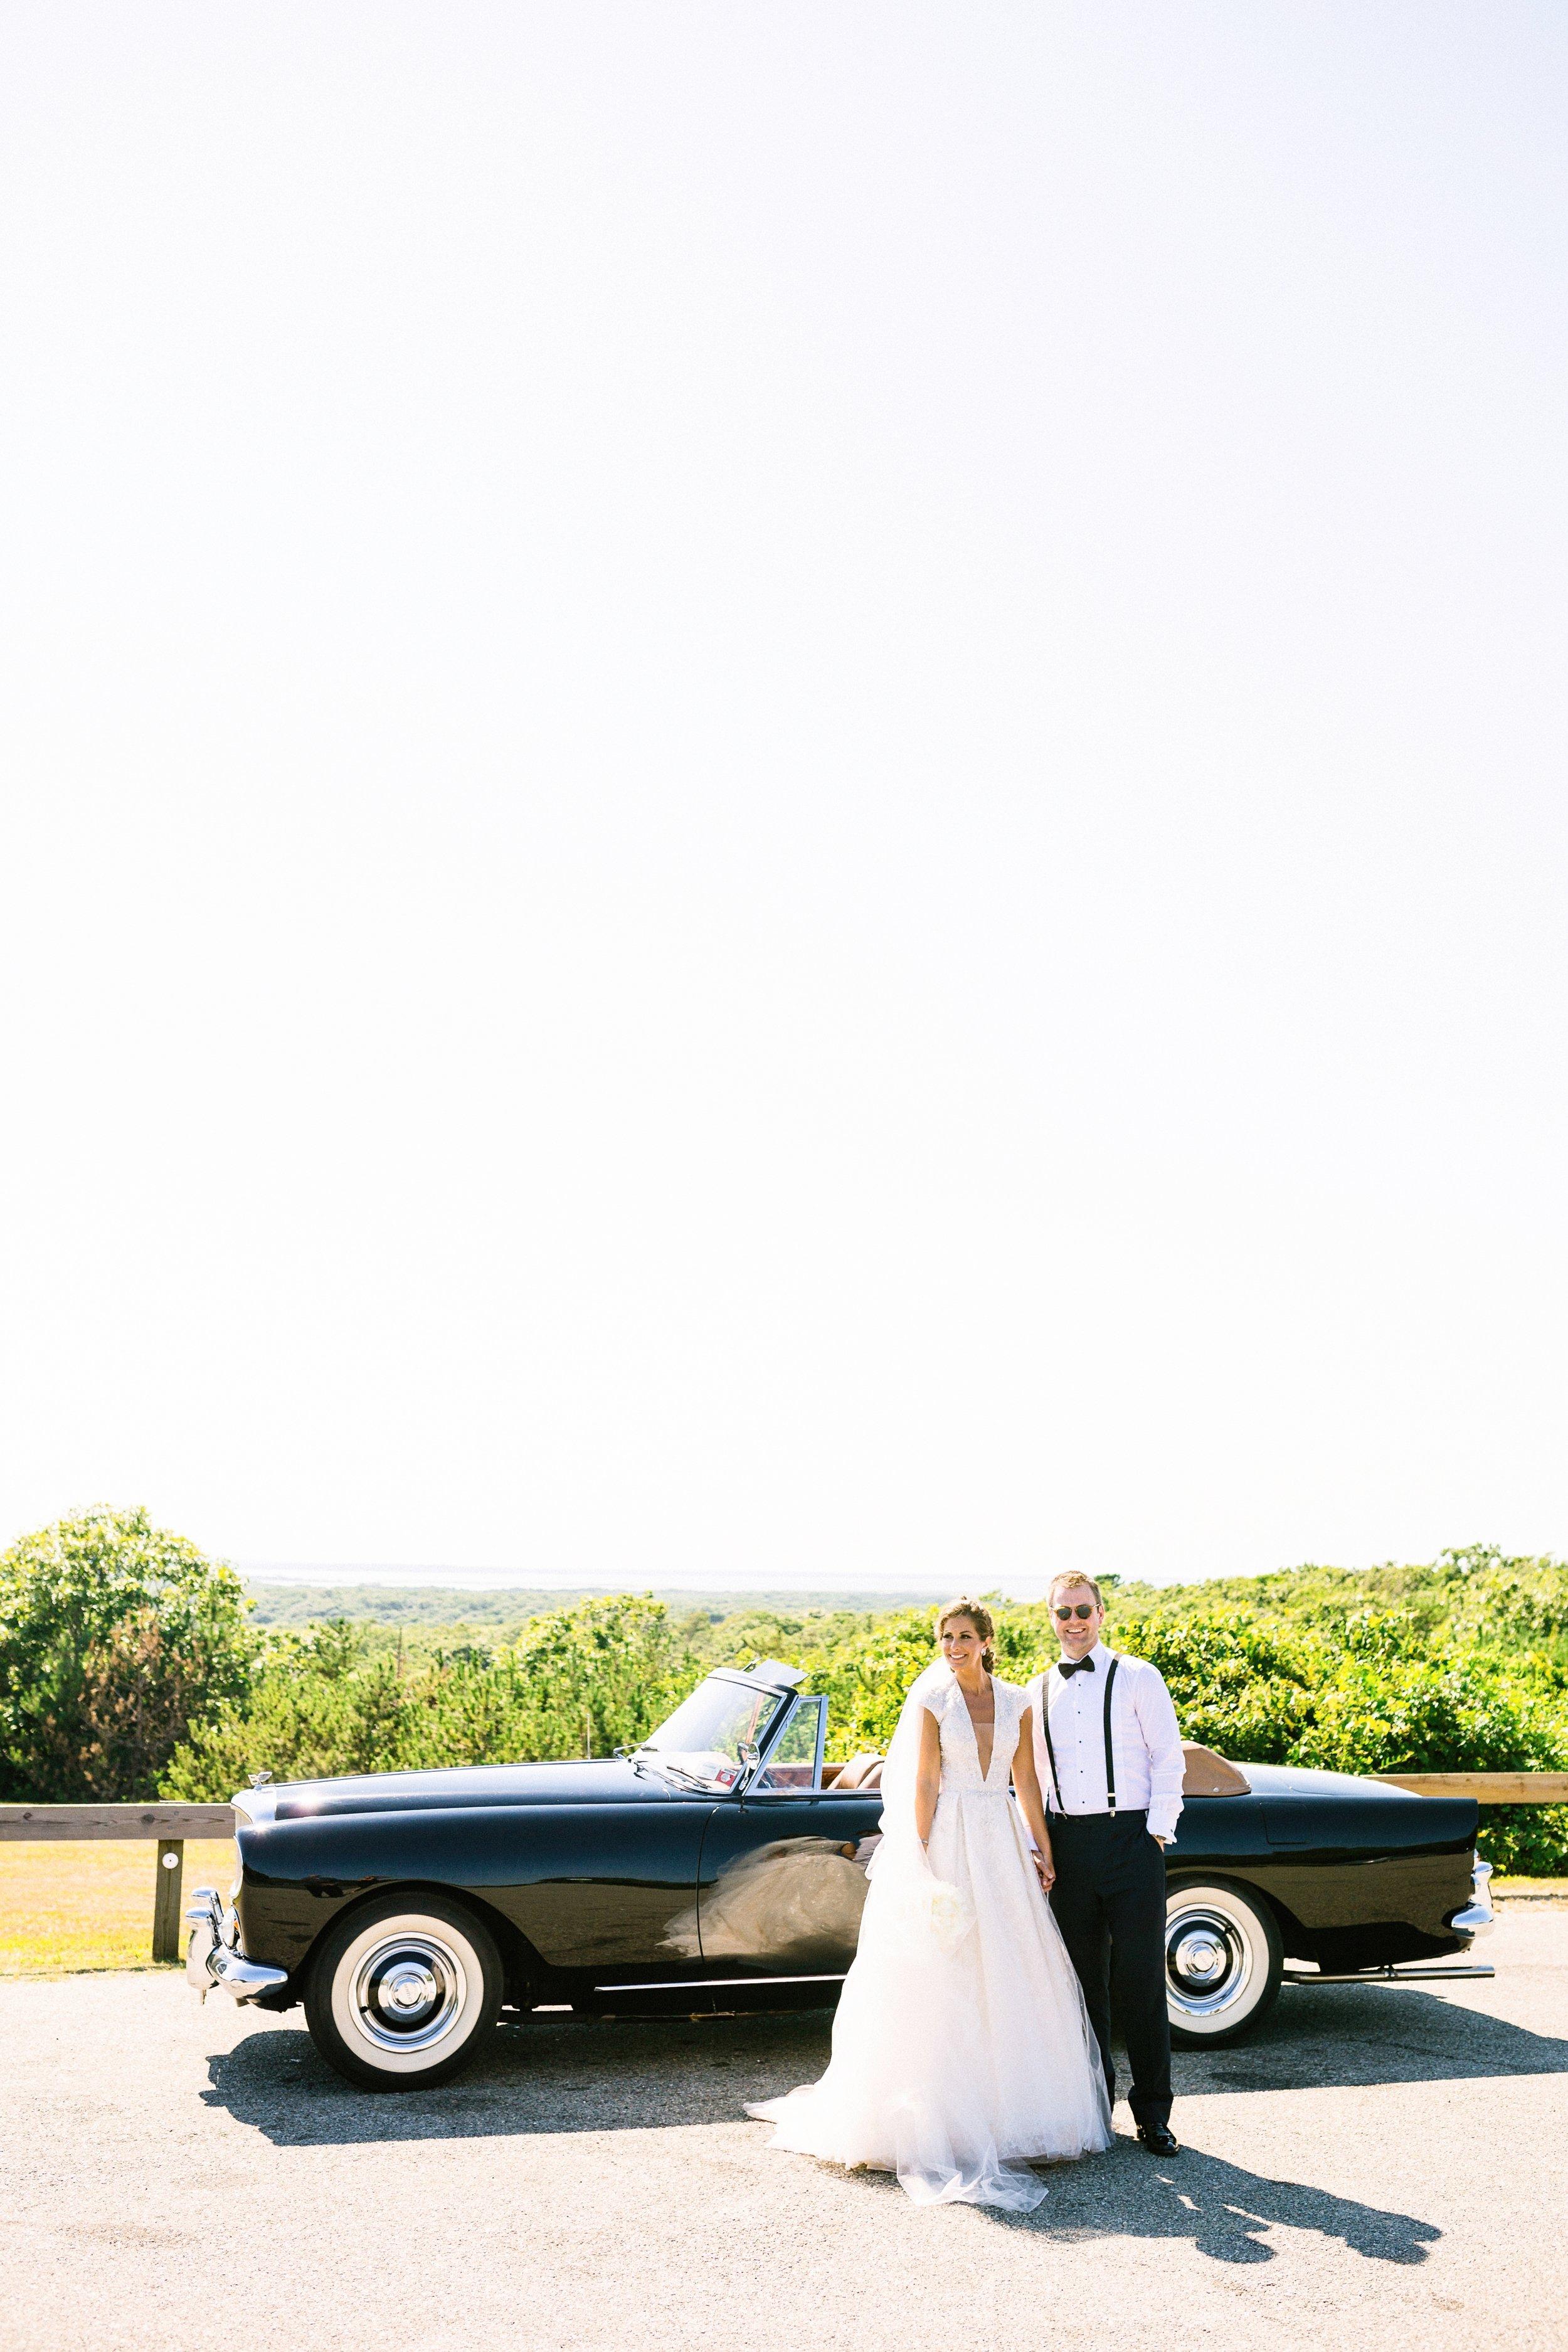 GURNEY'S_MONTAUK_WEDDING_BETSI_EWING_1